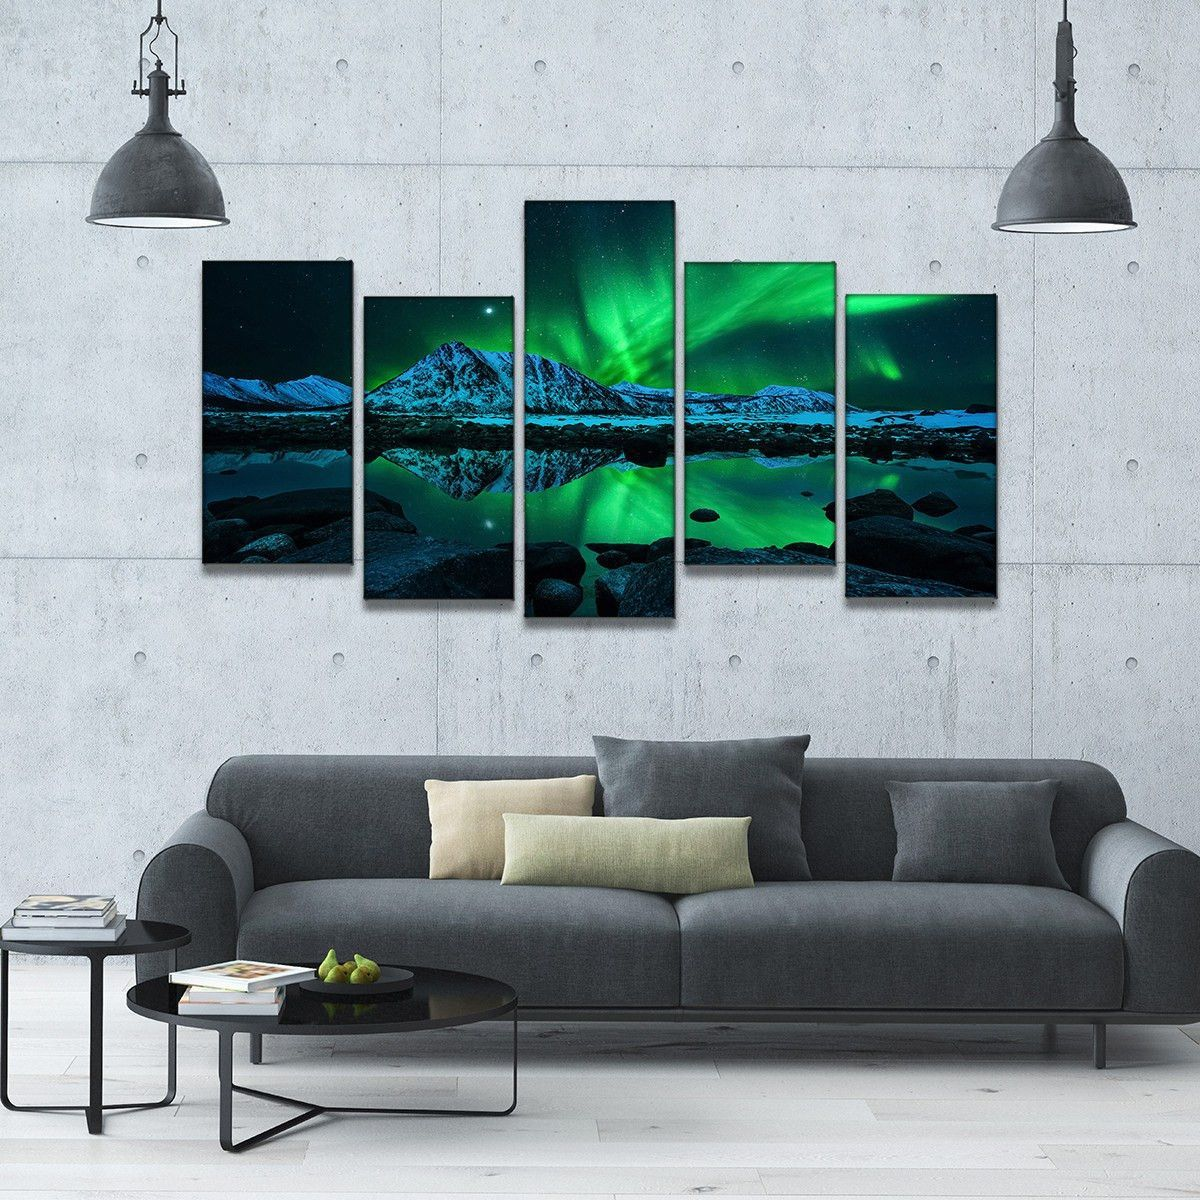 Futuristic Aurora 5 Piece Staggered Canvas Wall Art Artwork For Living Room Canvas Wall Art Landscape Artwork